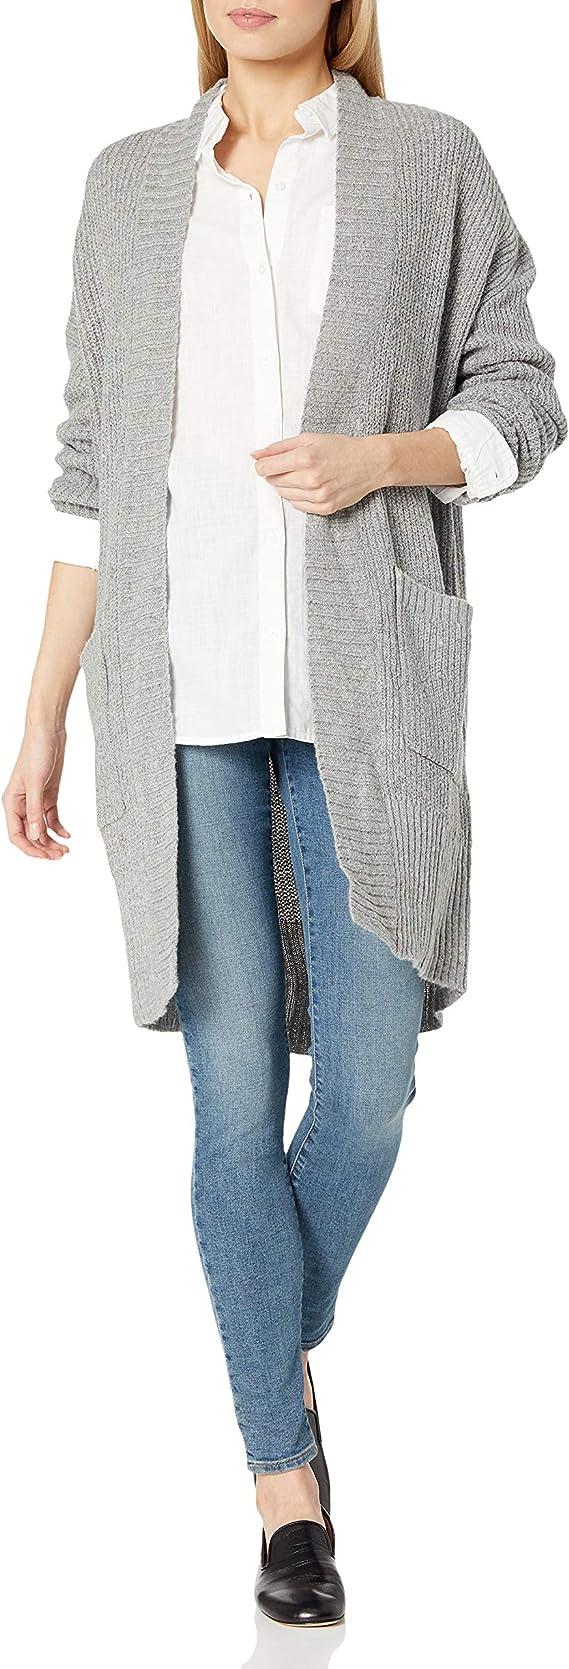 Freshman 1996 Womens Drop Shoulder Open Cardigan Sweater